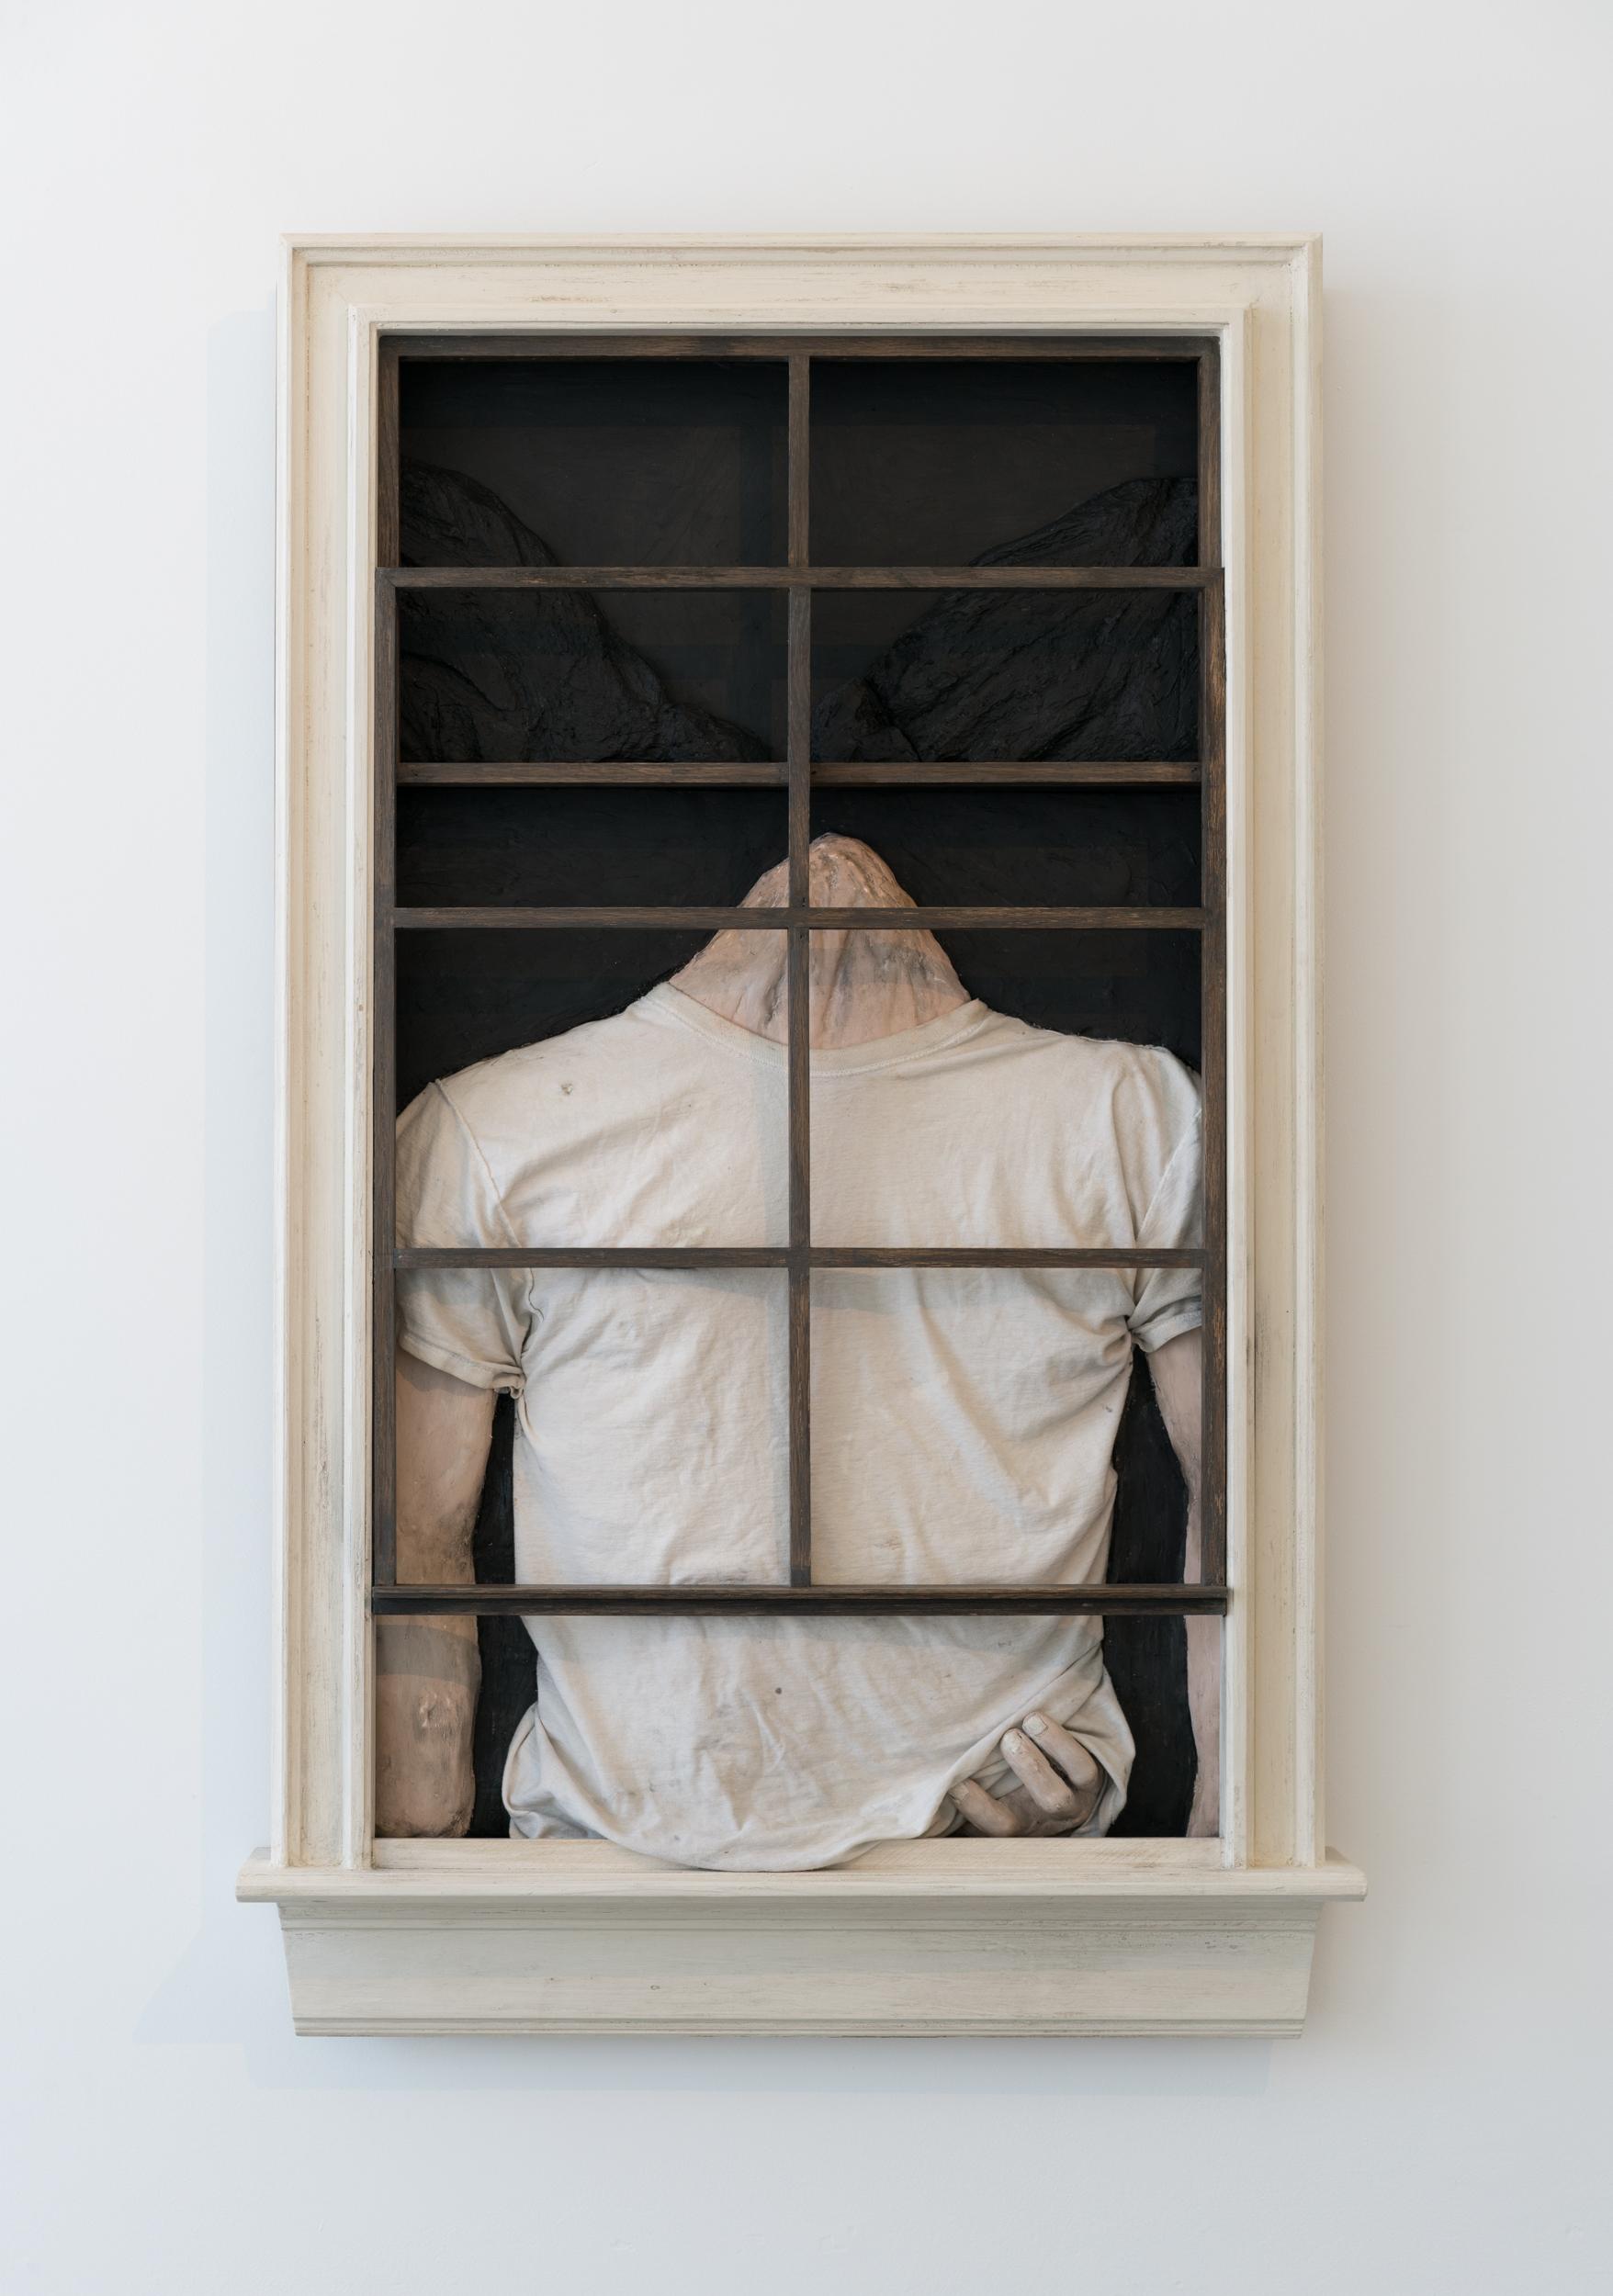 Dan Herschlein - Worm - AALA Gallery - 2016 - Install Images - Medium Res-2.jpg